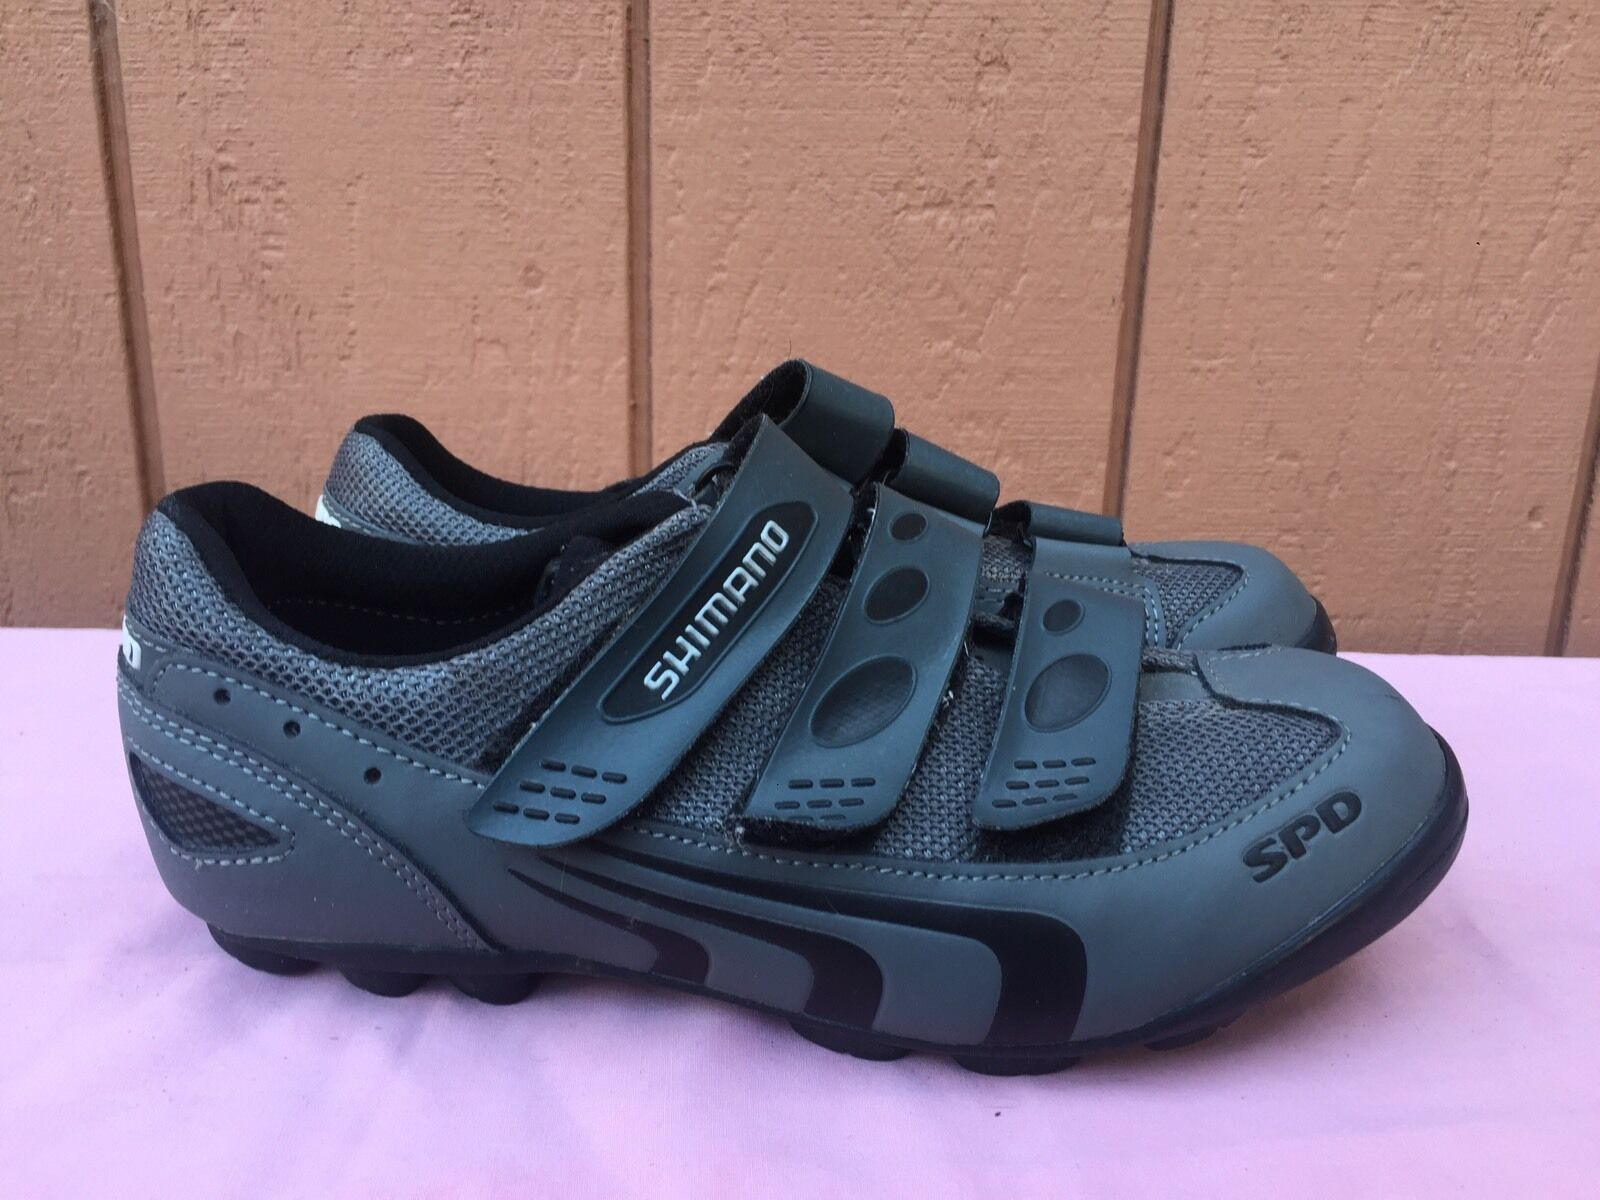 EUC  Shimano SPD Men's G  Cycling Mountain Bike shoes US Sz 7 M-1206  online outlet sale